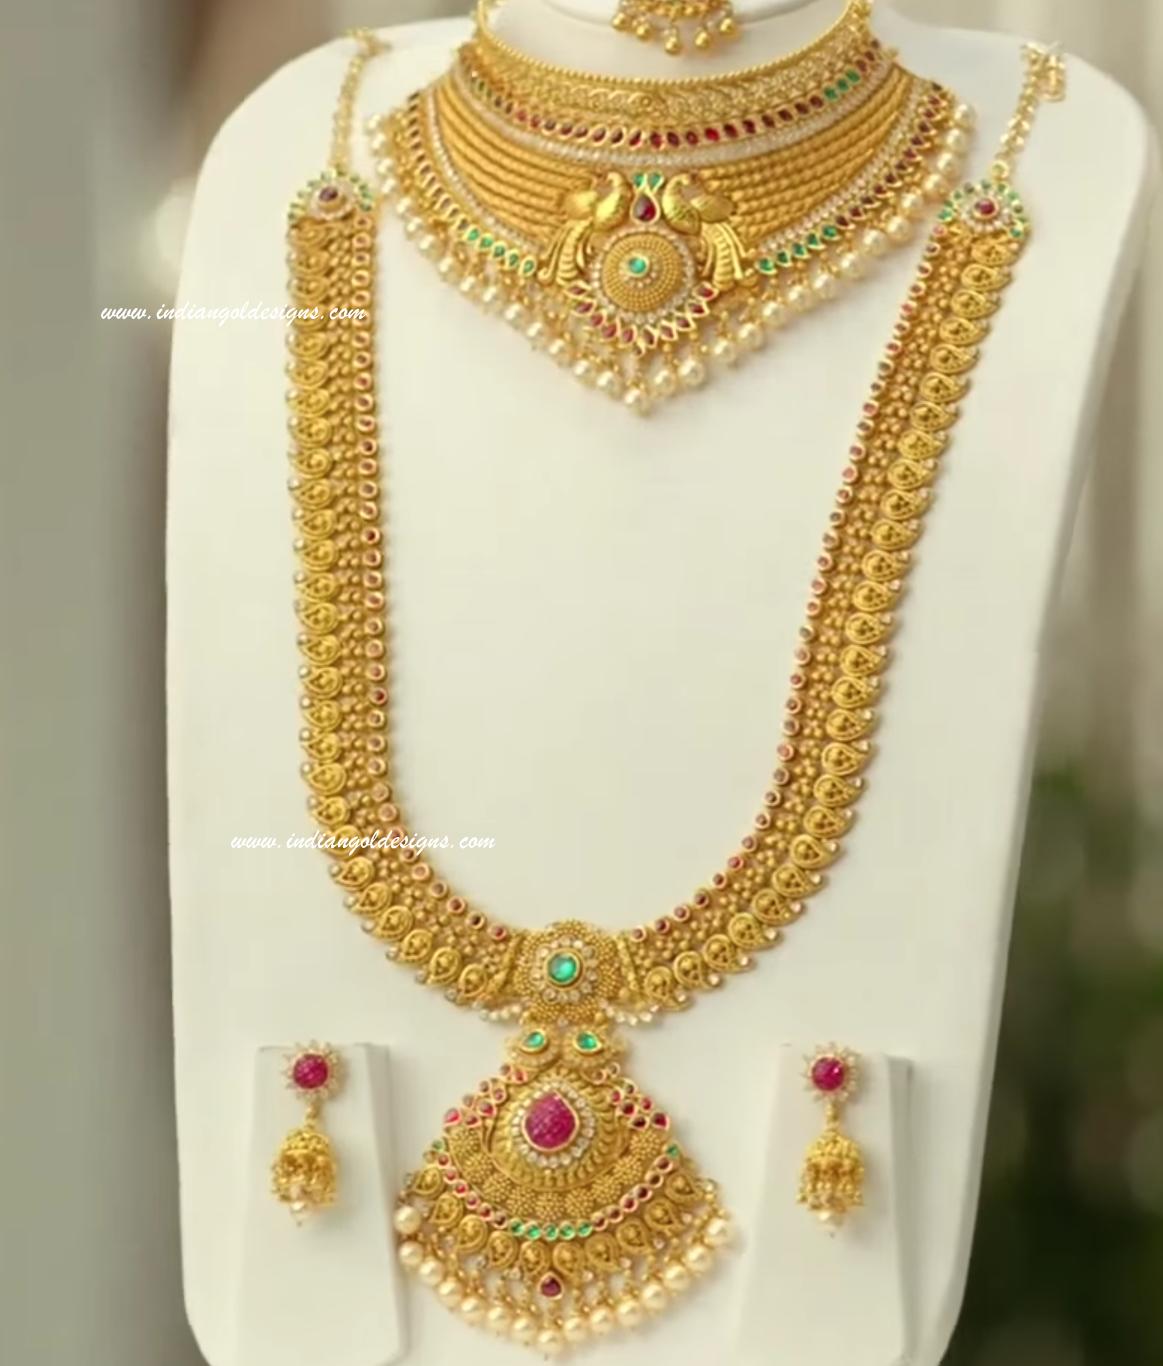 Gold and Diamond jewellery designs: Beautiful gold bridal jewellery